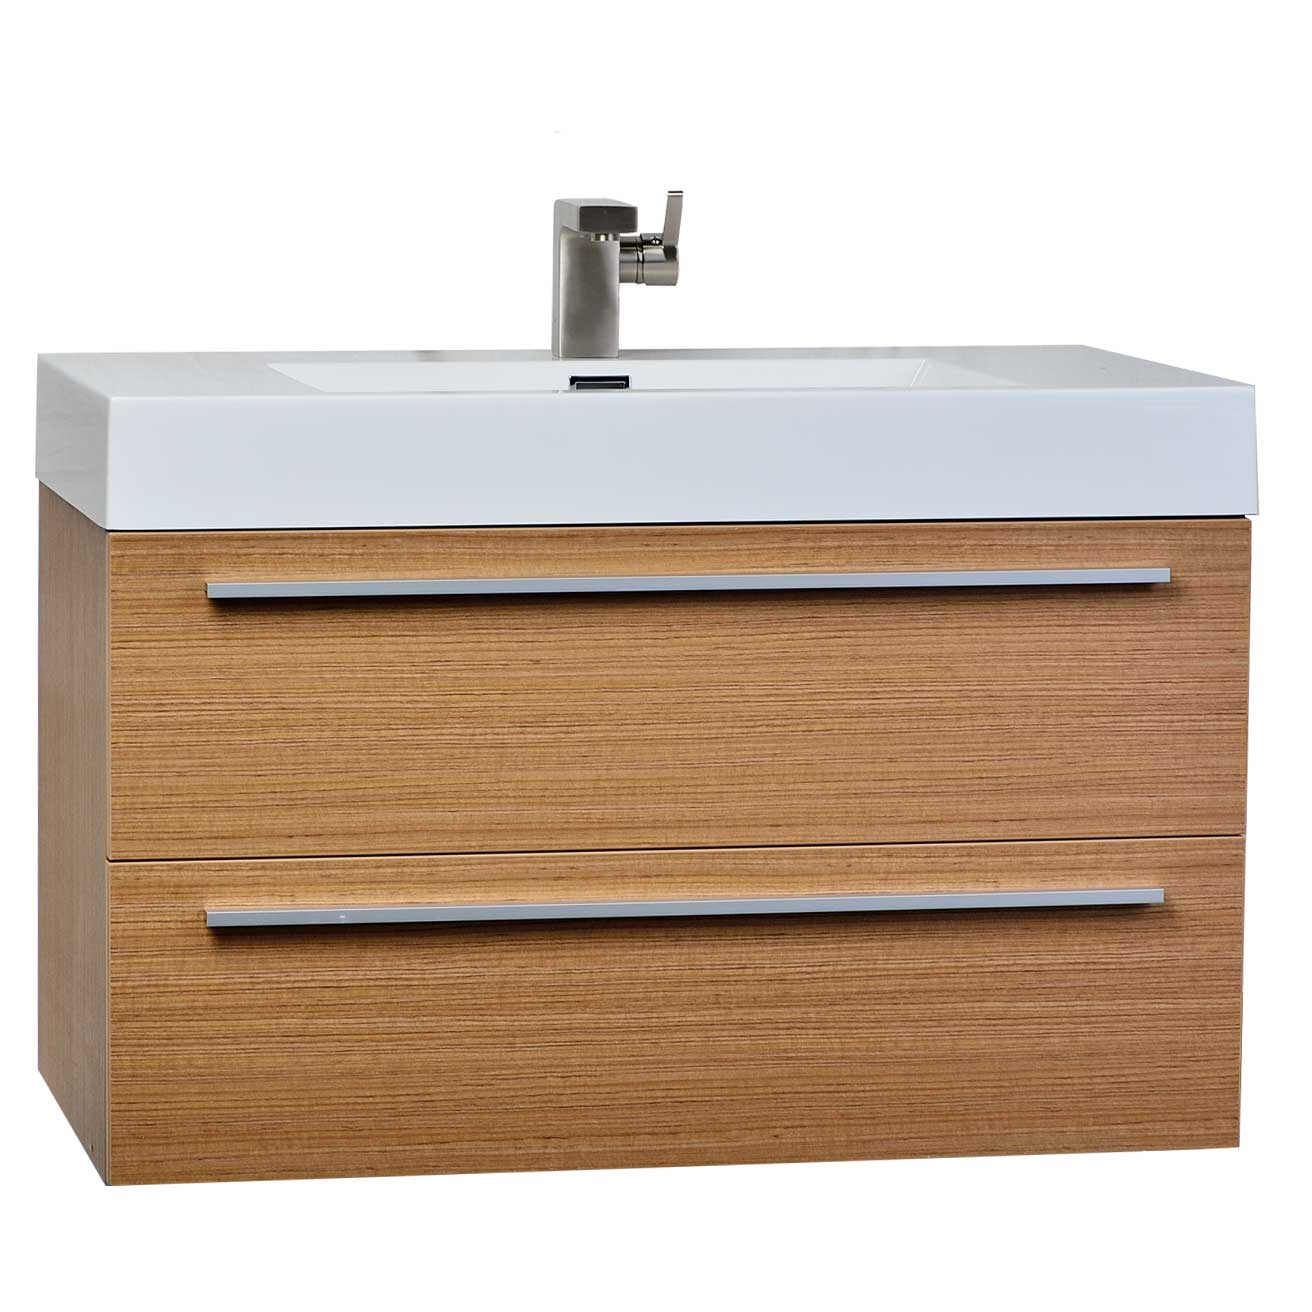 Bathroom Vanity Lights Wood : Buy 35.5 In. Wall-Mount Contemporary Bathroom Vanity Light Teak TN-M900-PT on Conceptbaths.com ...